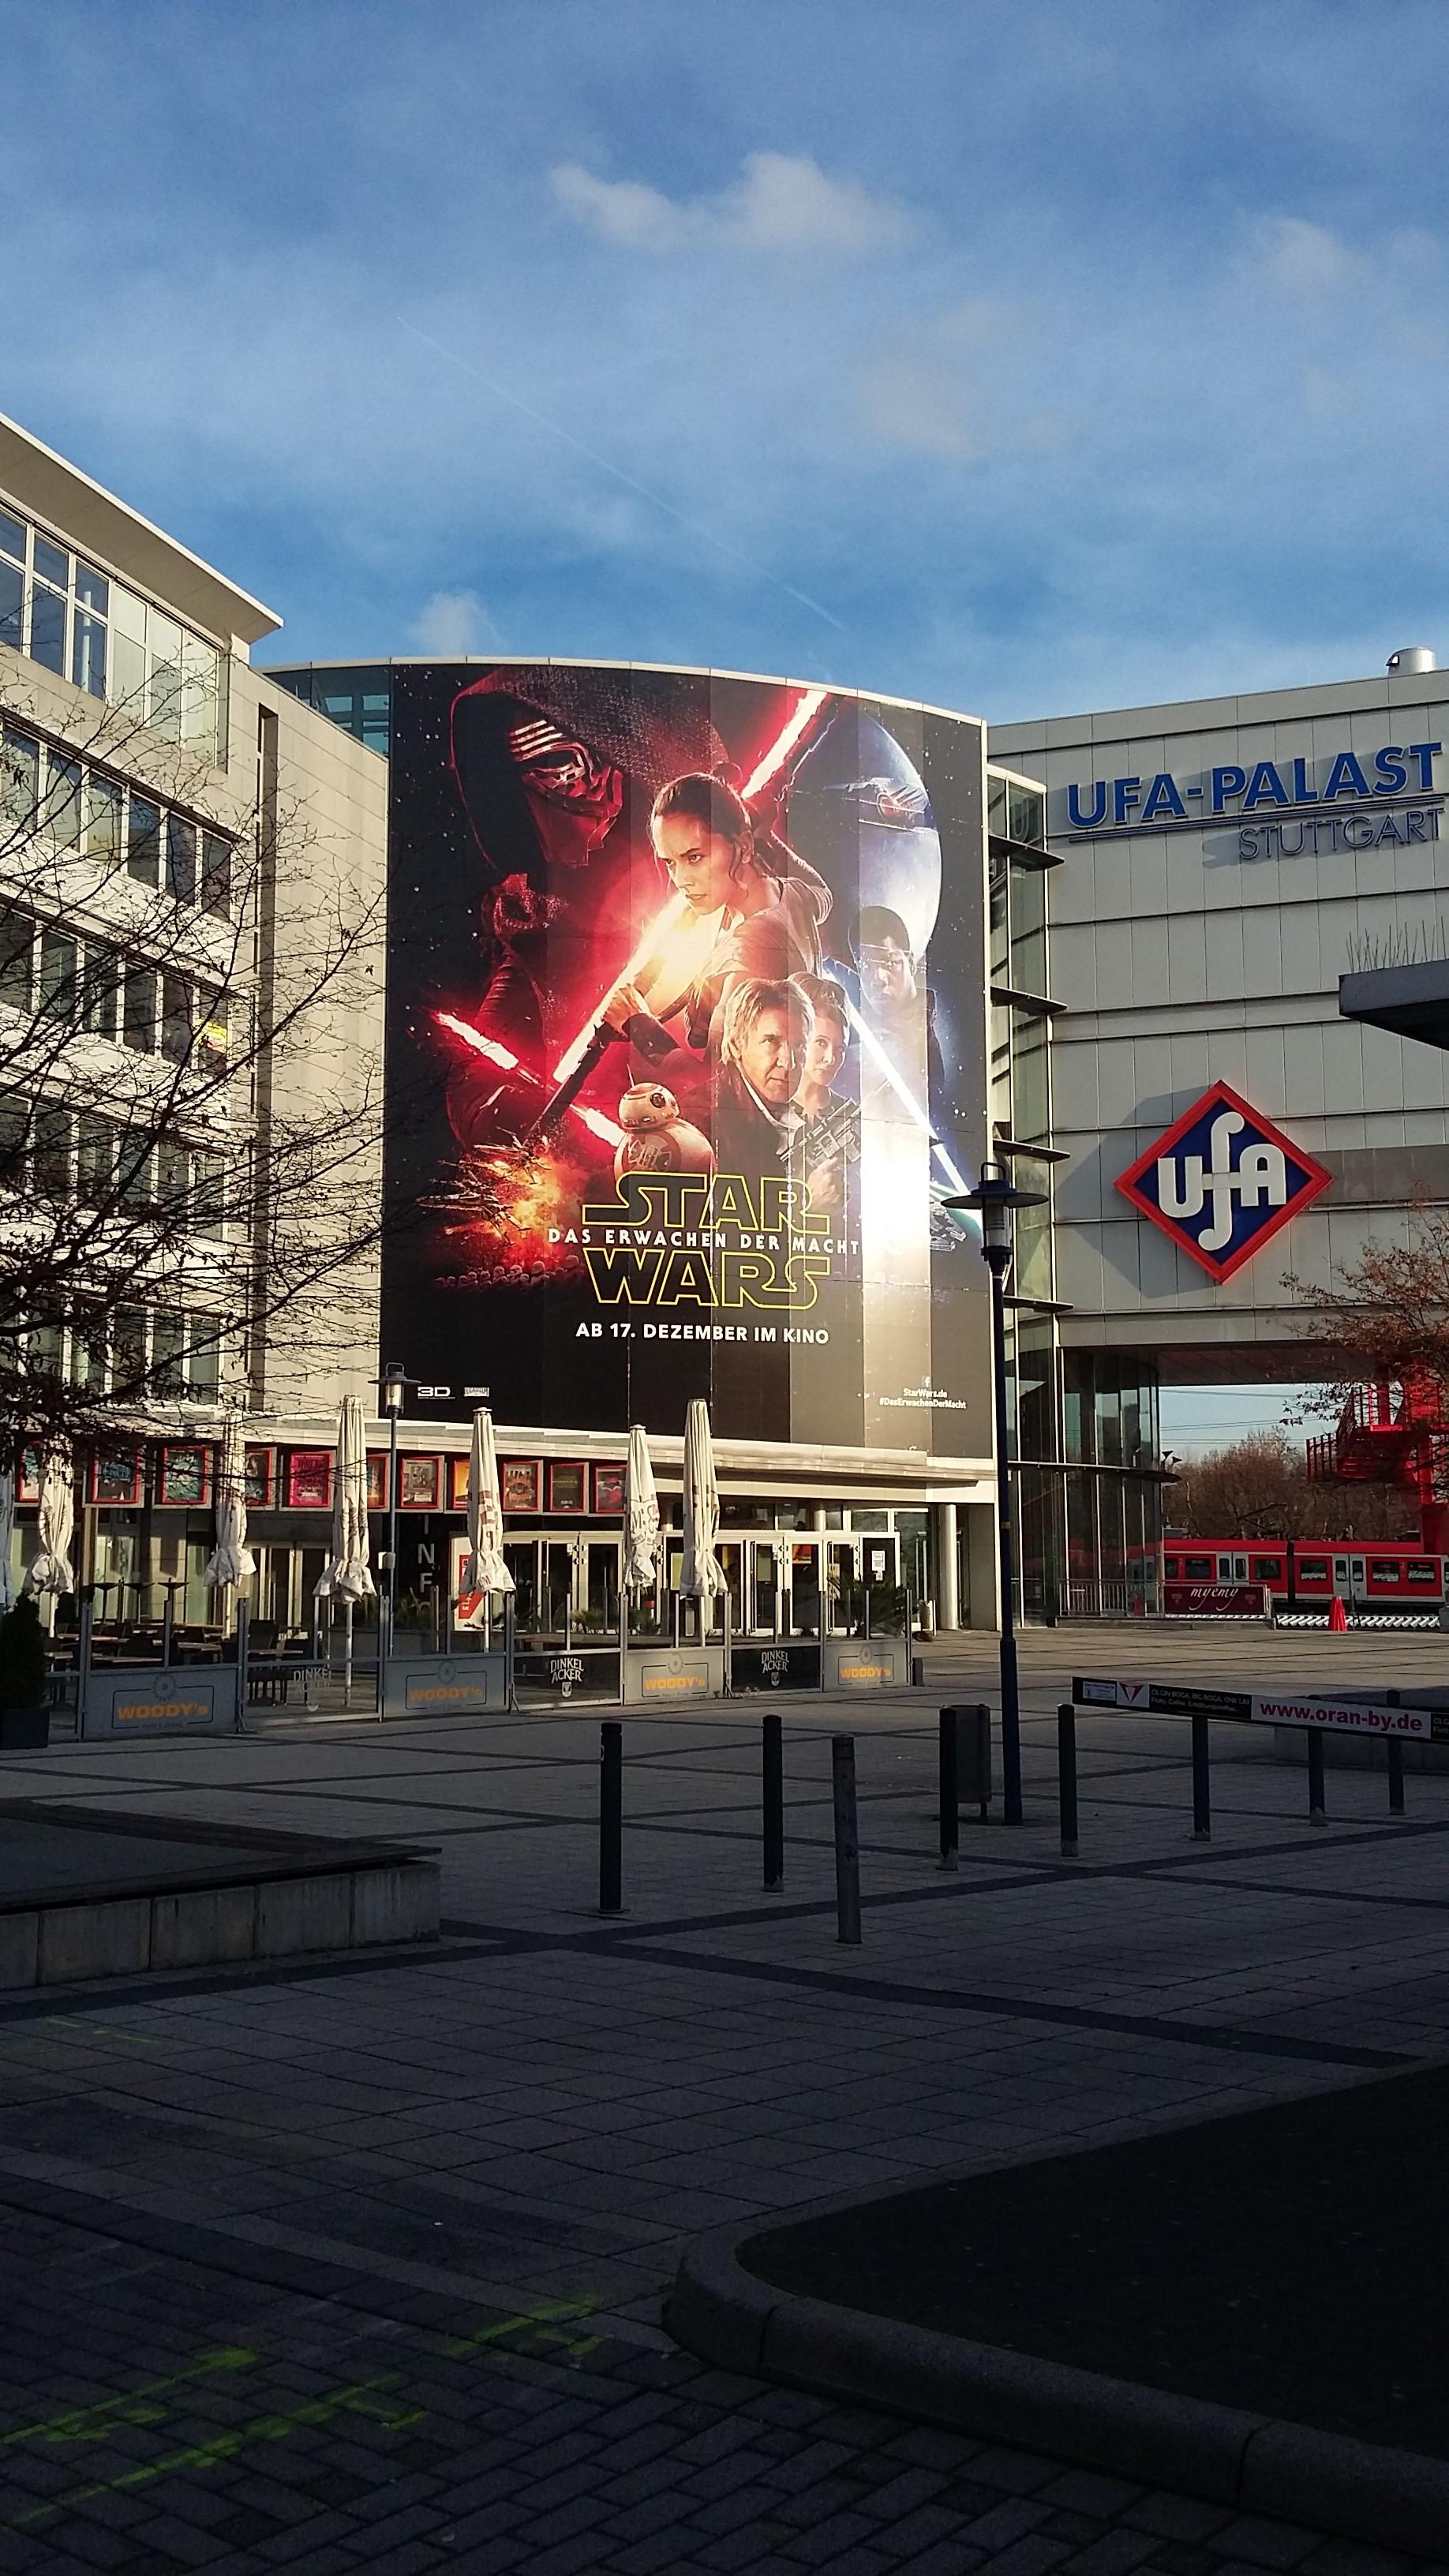 Kino Stuttgart Ufa